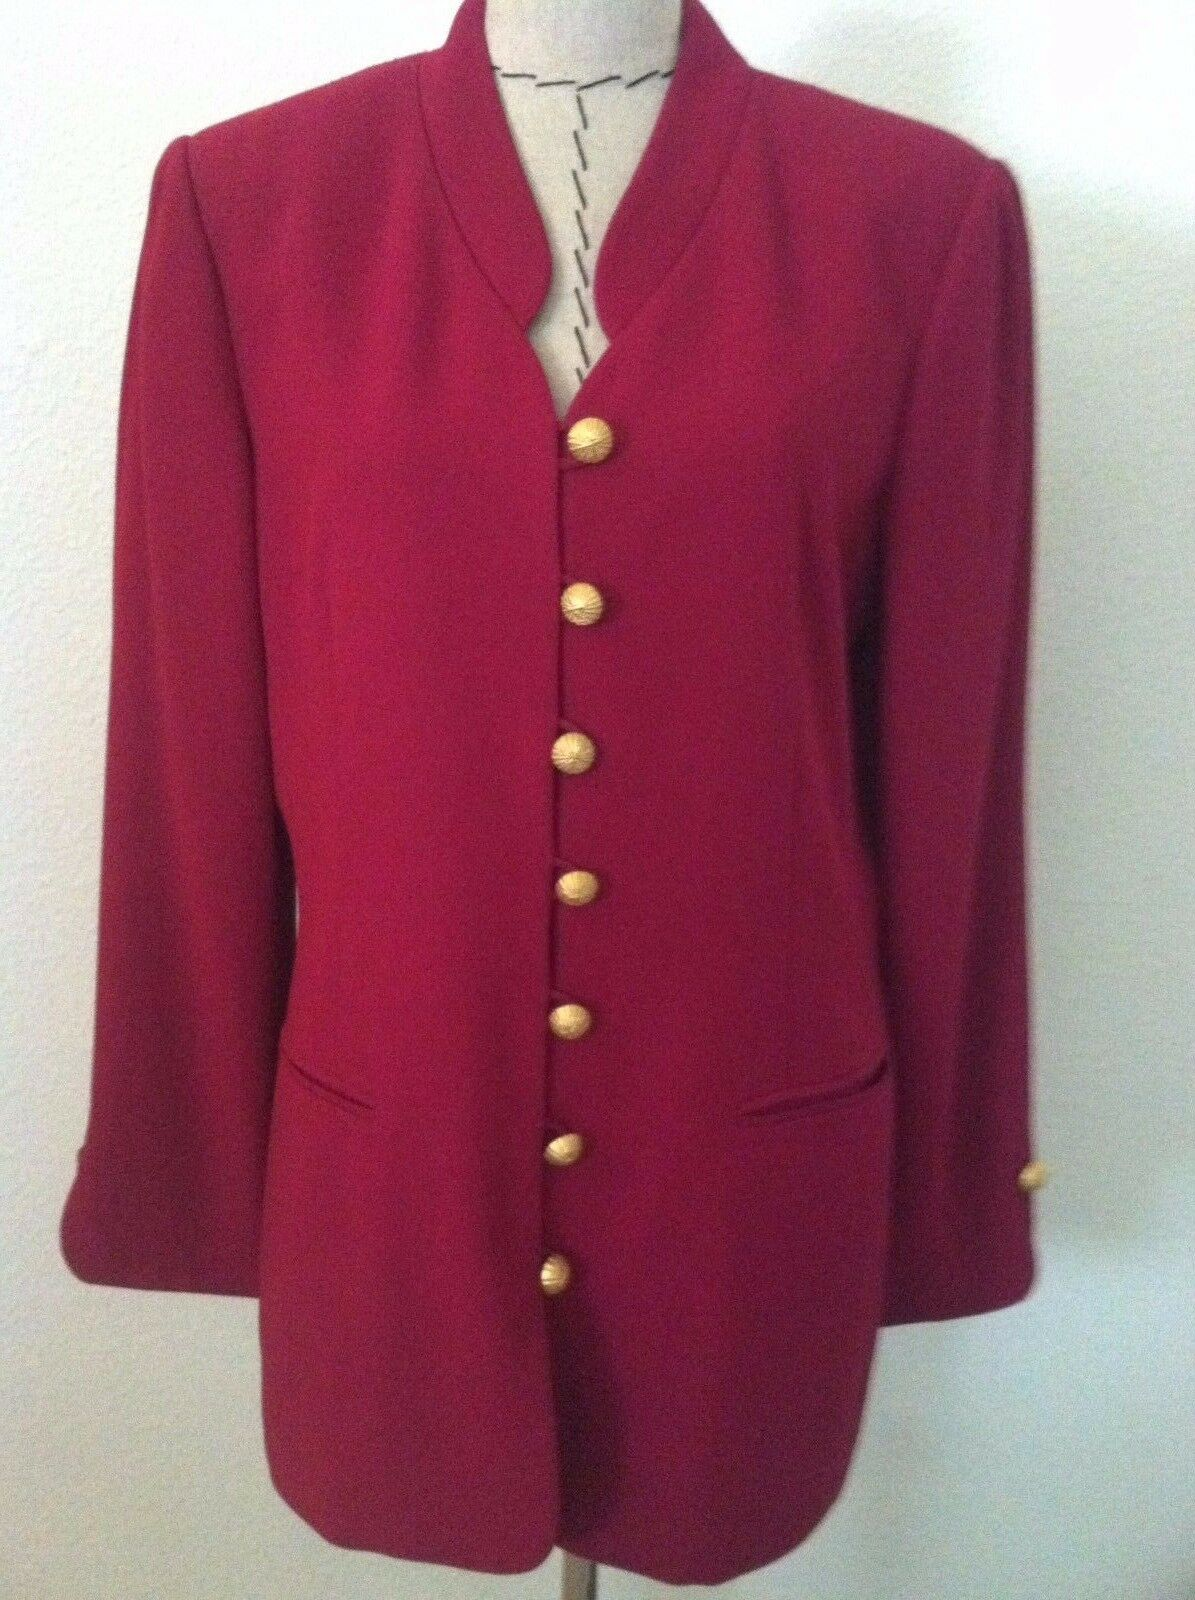 Casual Corner women blazer purple purple gold matte button up no collar size 14